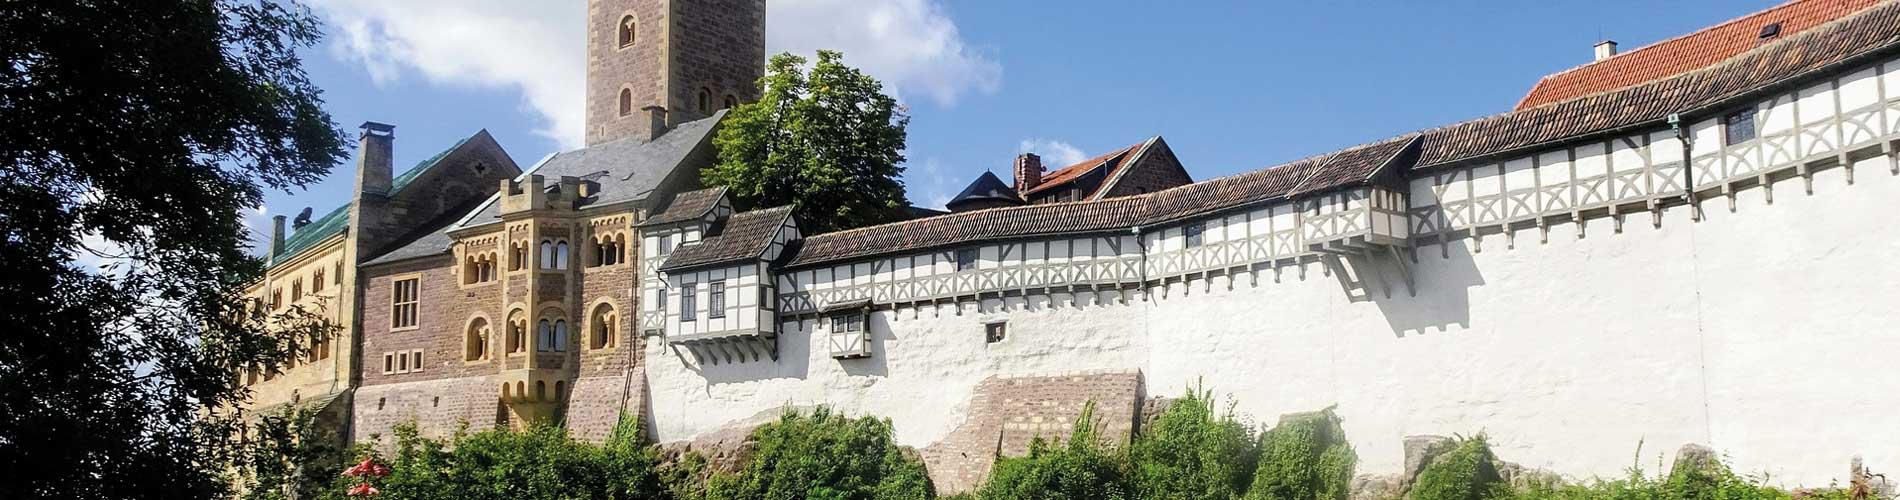 Blog_TopCastlesGermany_Wartburg-Castle_1900x500